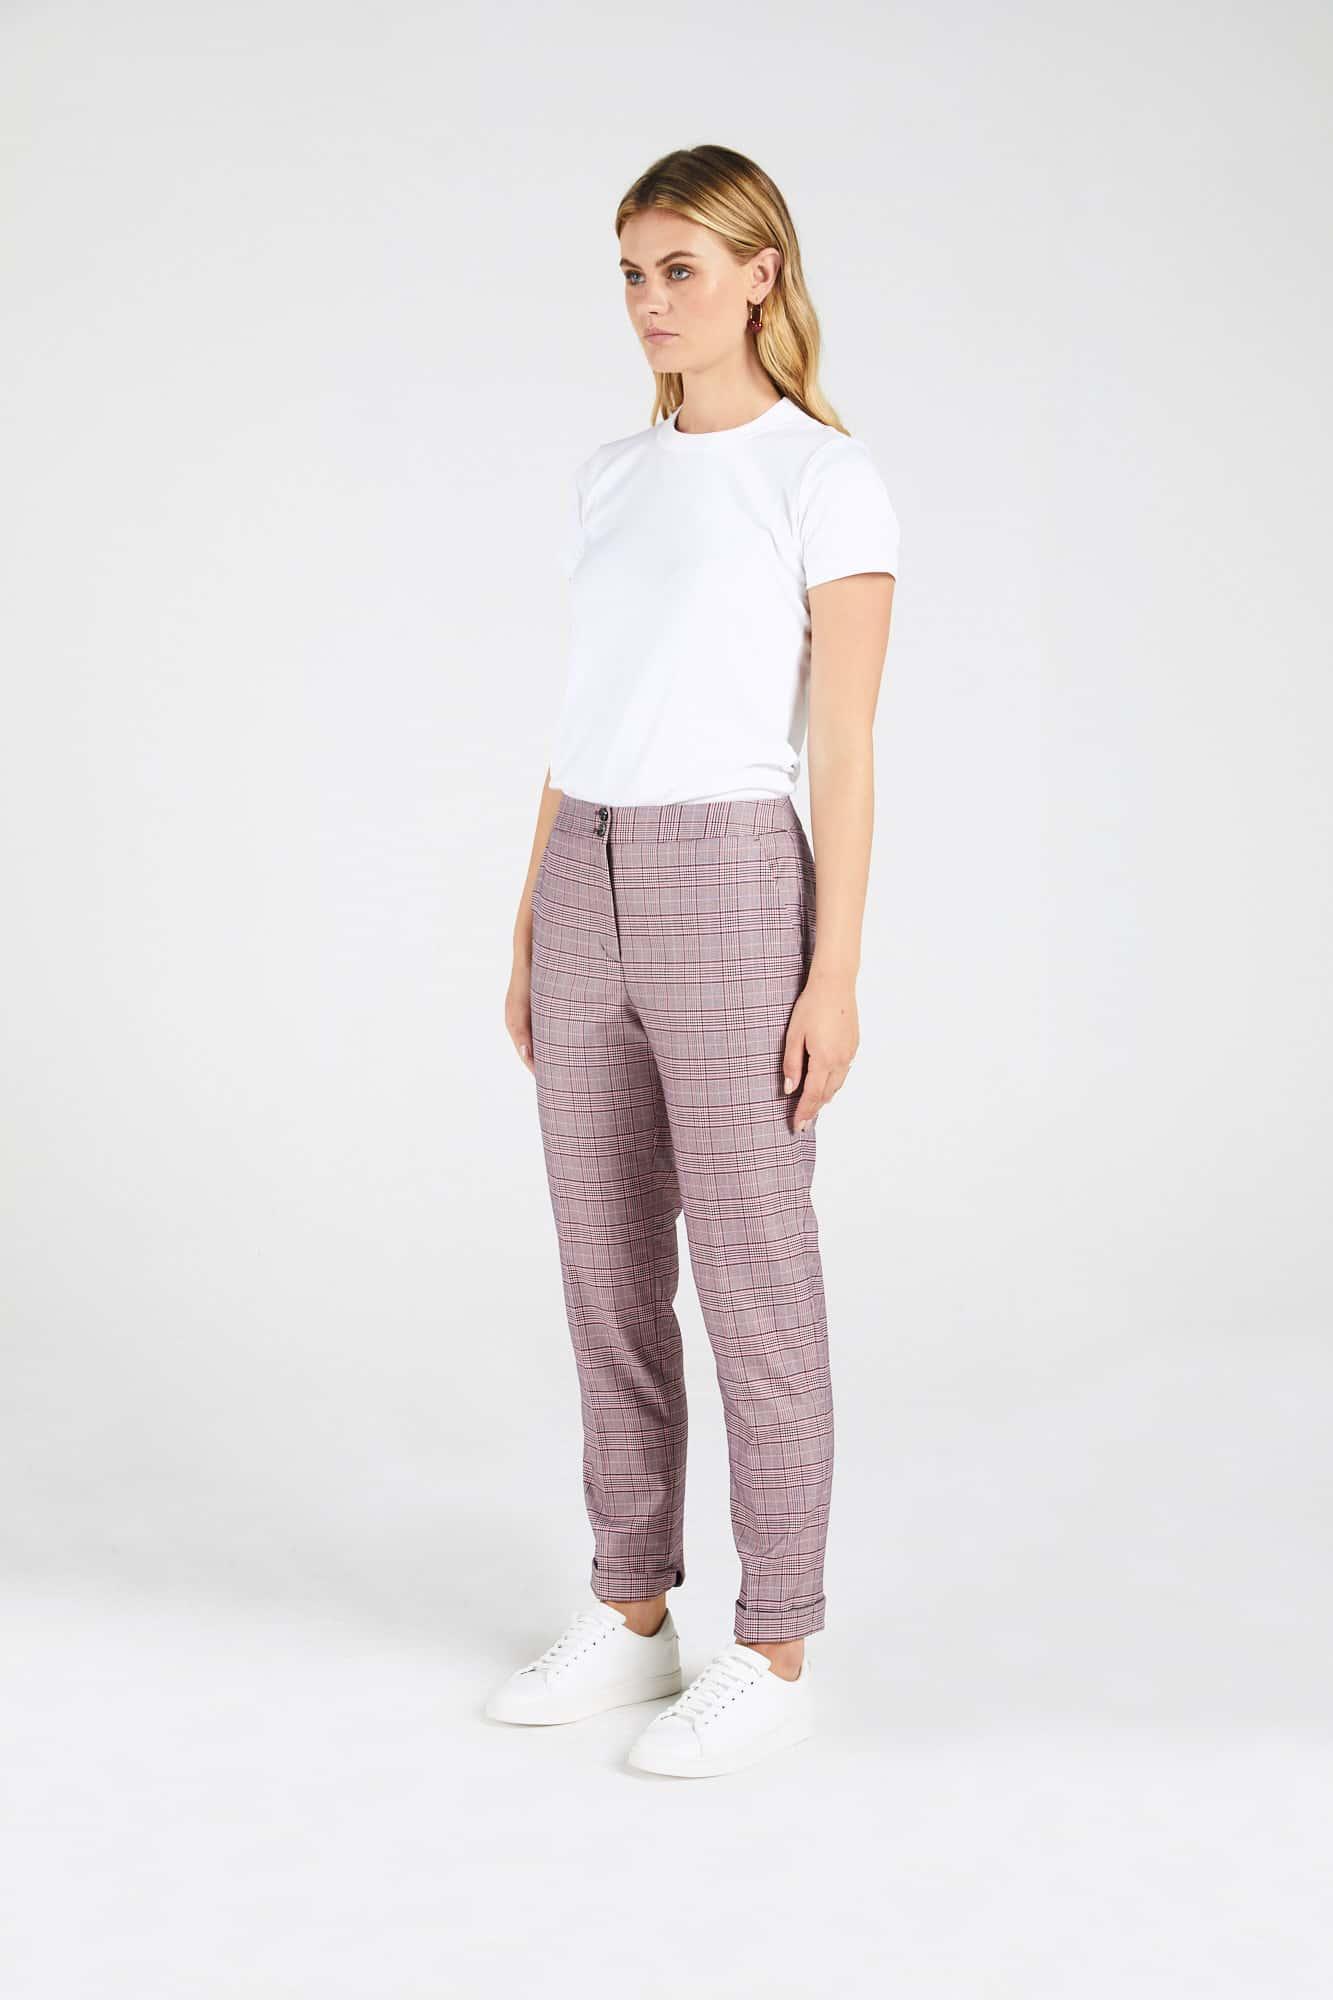 InStitchu Collection The Thomas Pink Glen Plaid Pants